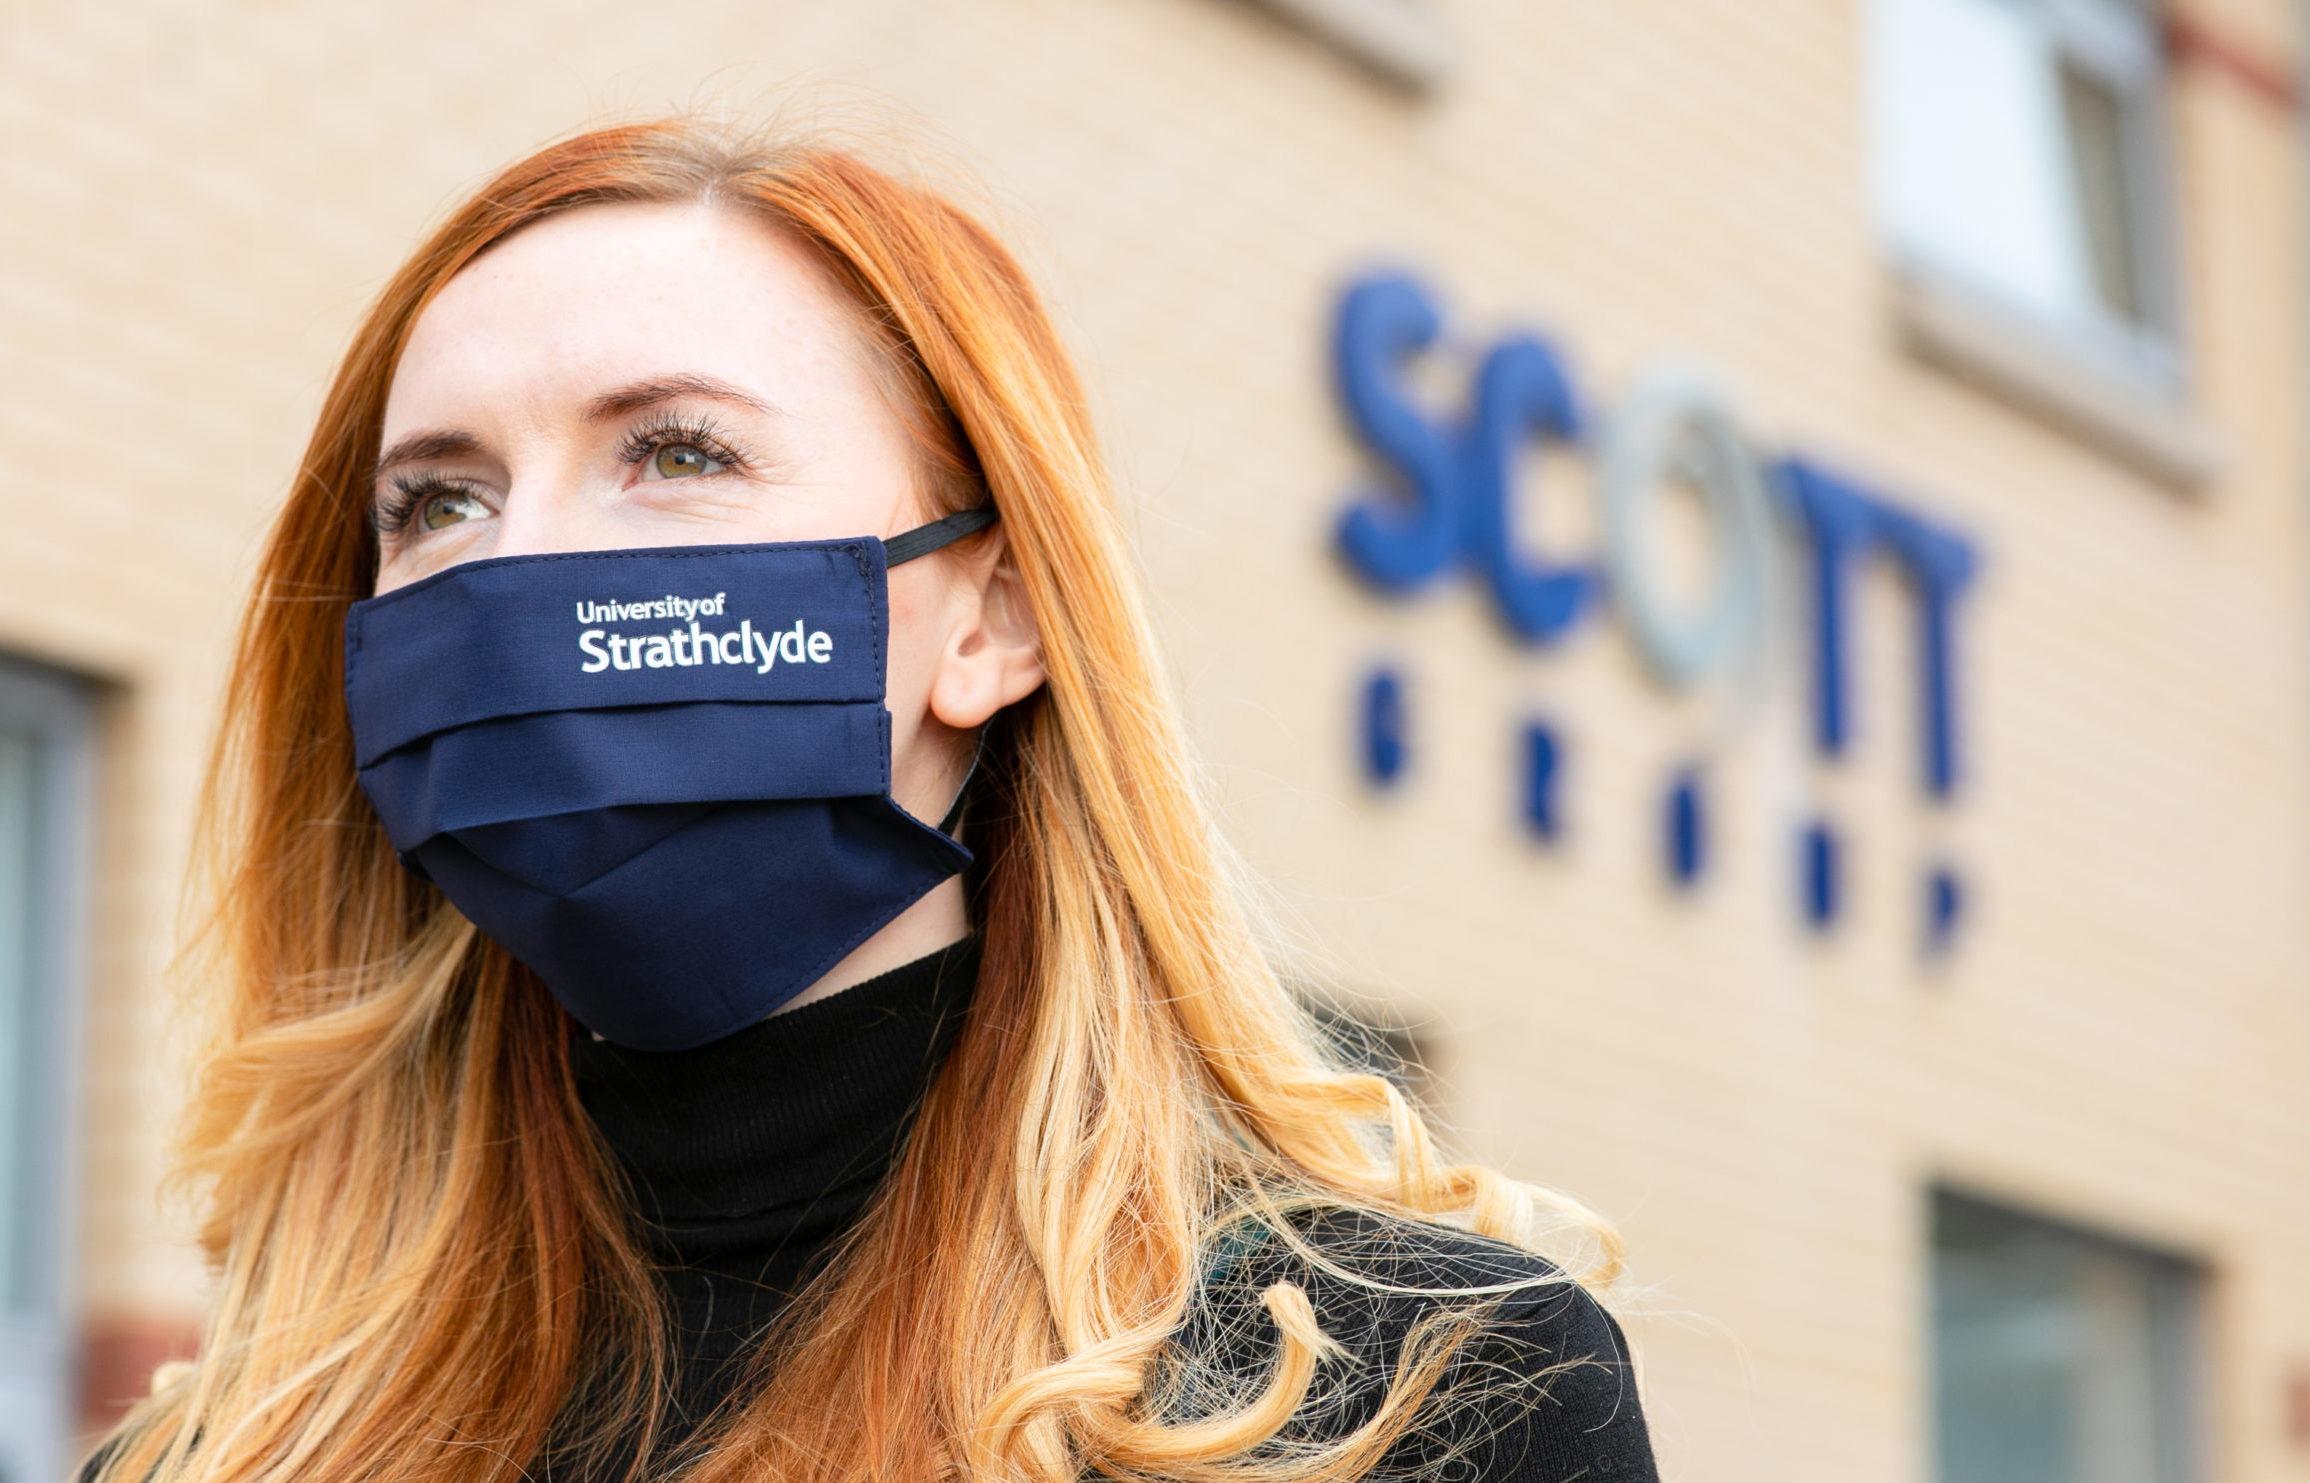 Seahawk Apparel branded face mask